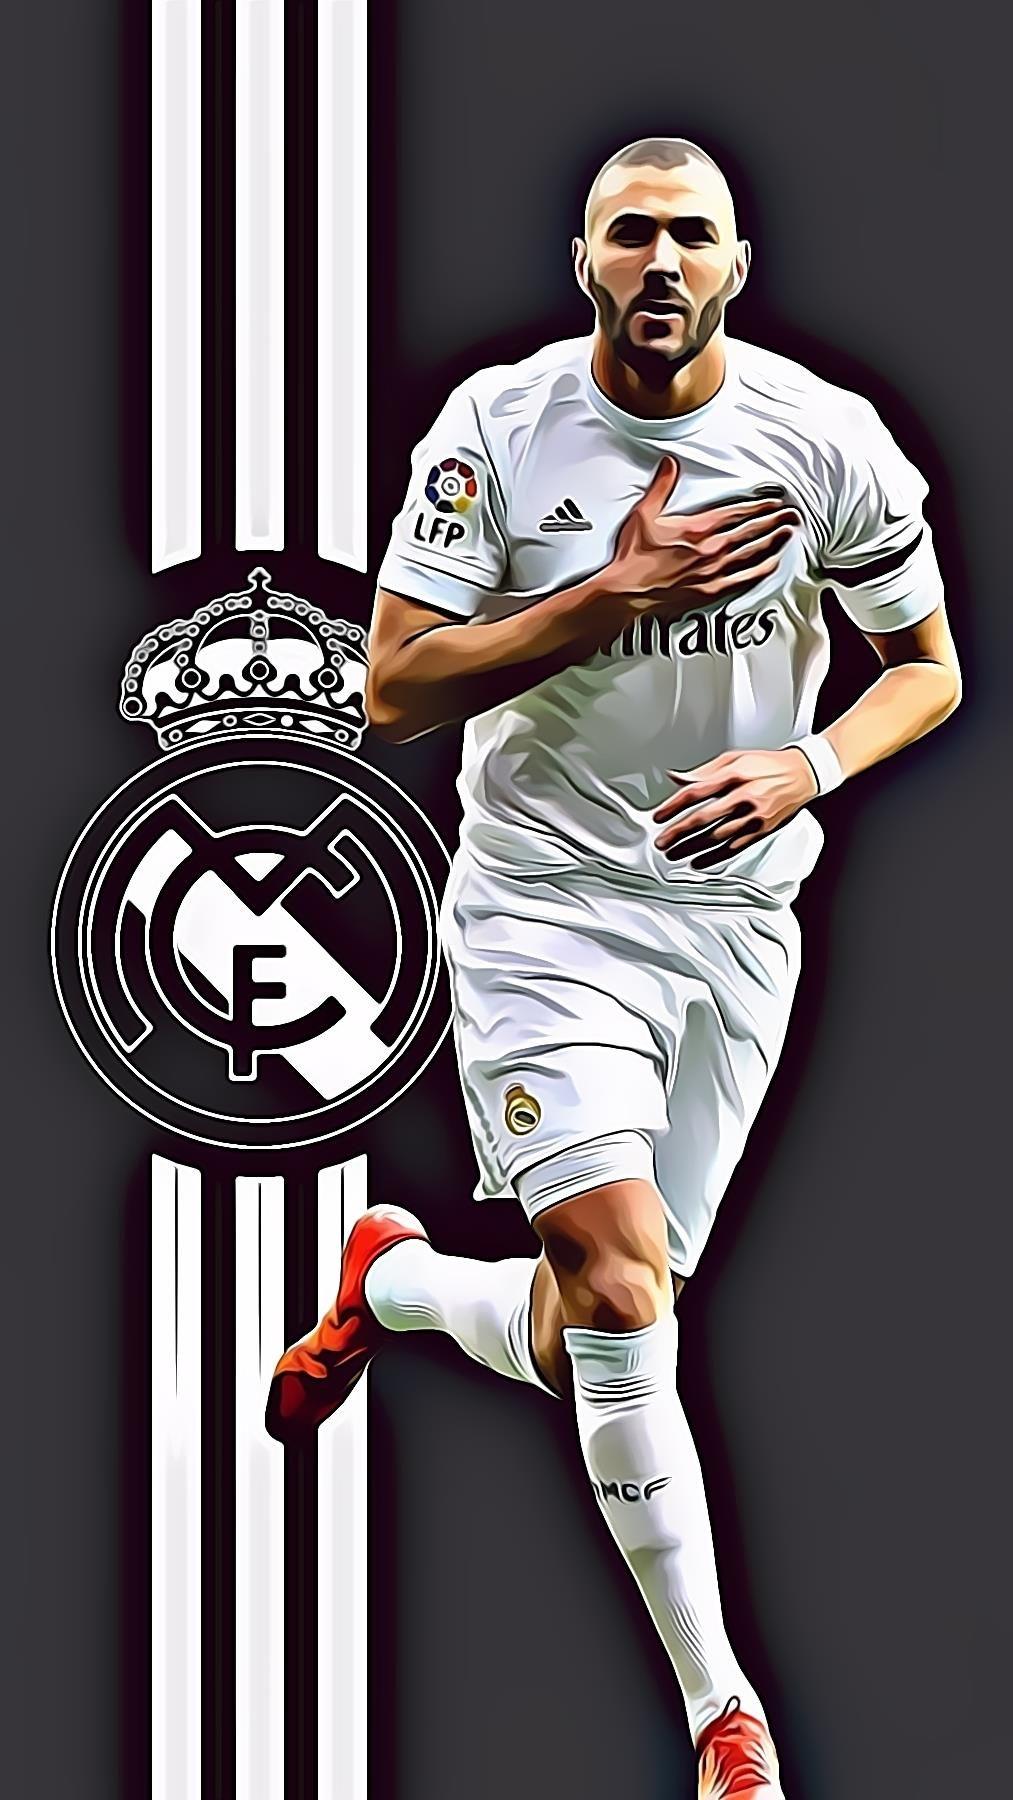 Real Madrid Wallpapers In 2020 Real Madrid Wallpapers Madrid Wallpaper Real Madrid Team